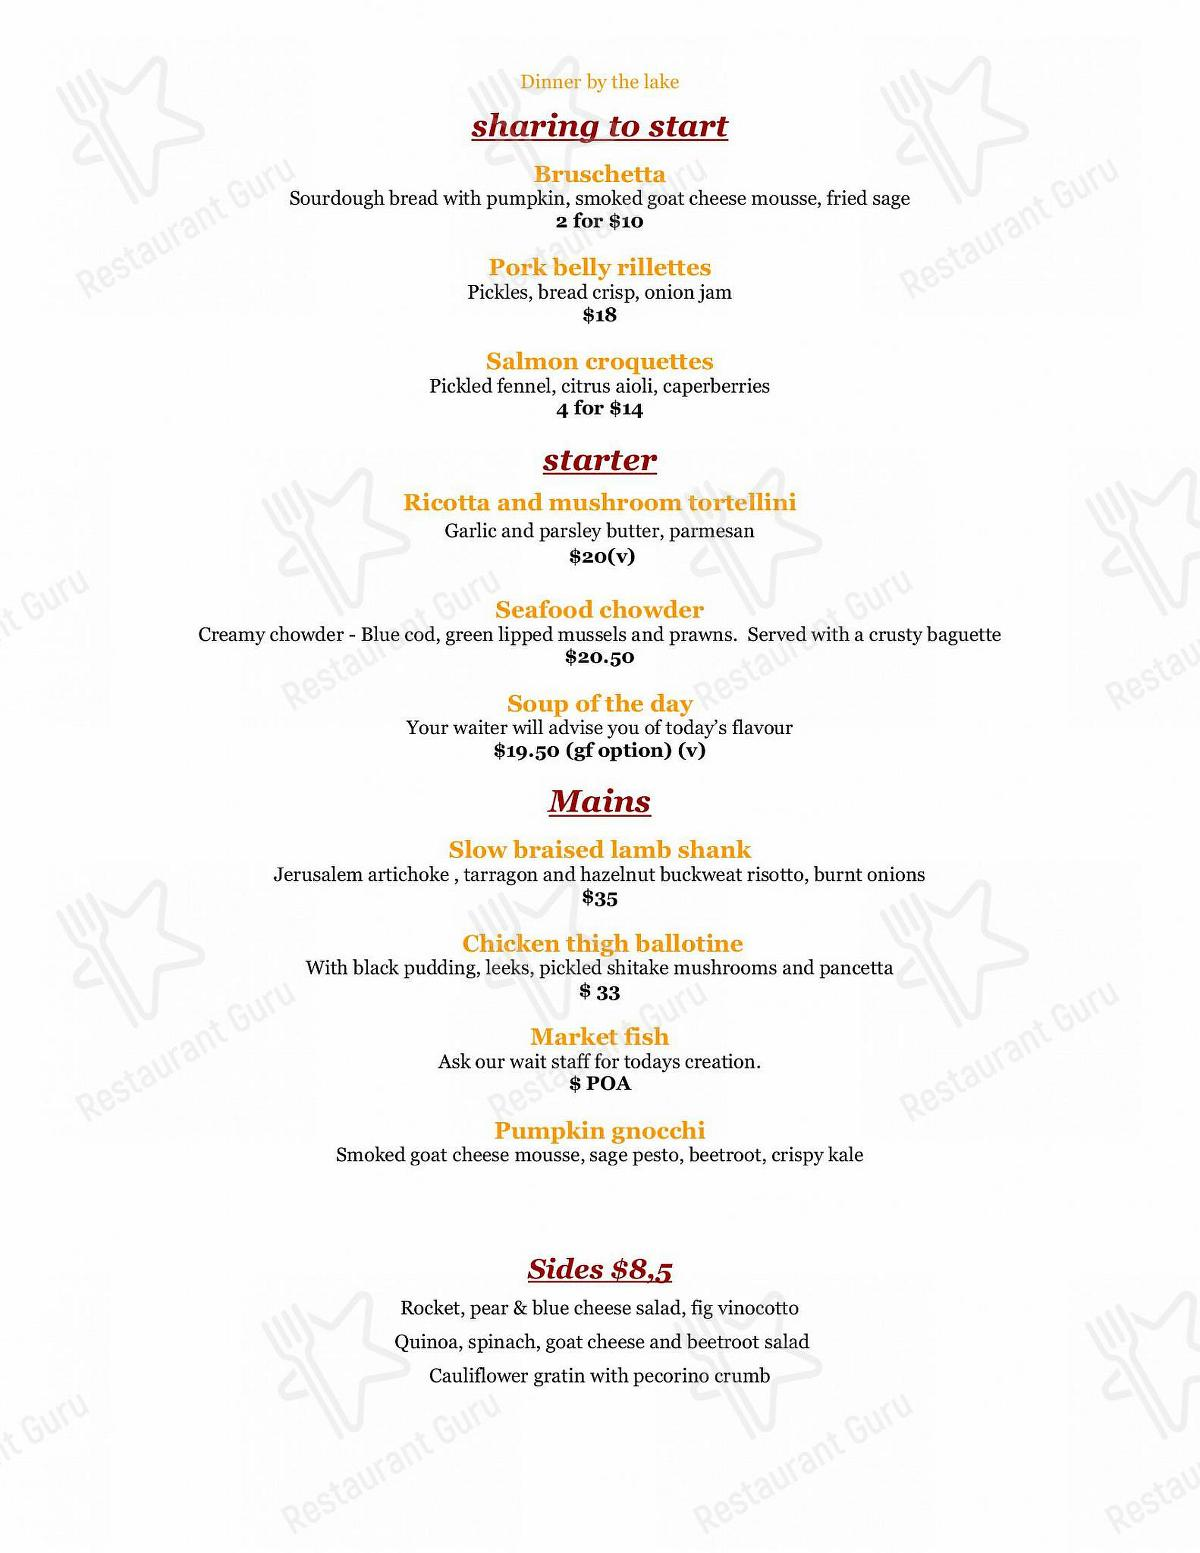 The Bathhouse menu - meals and drinks